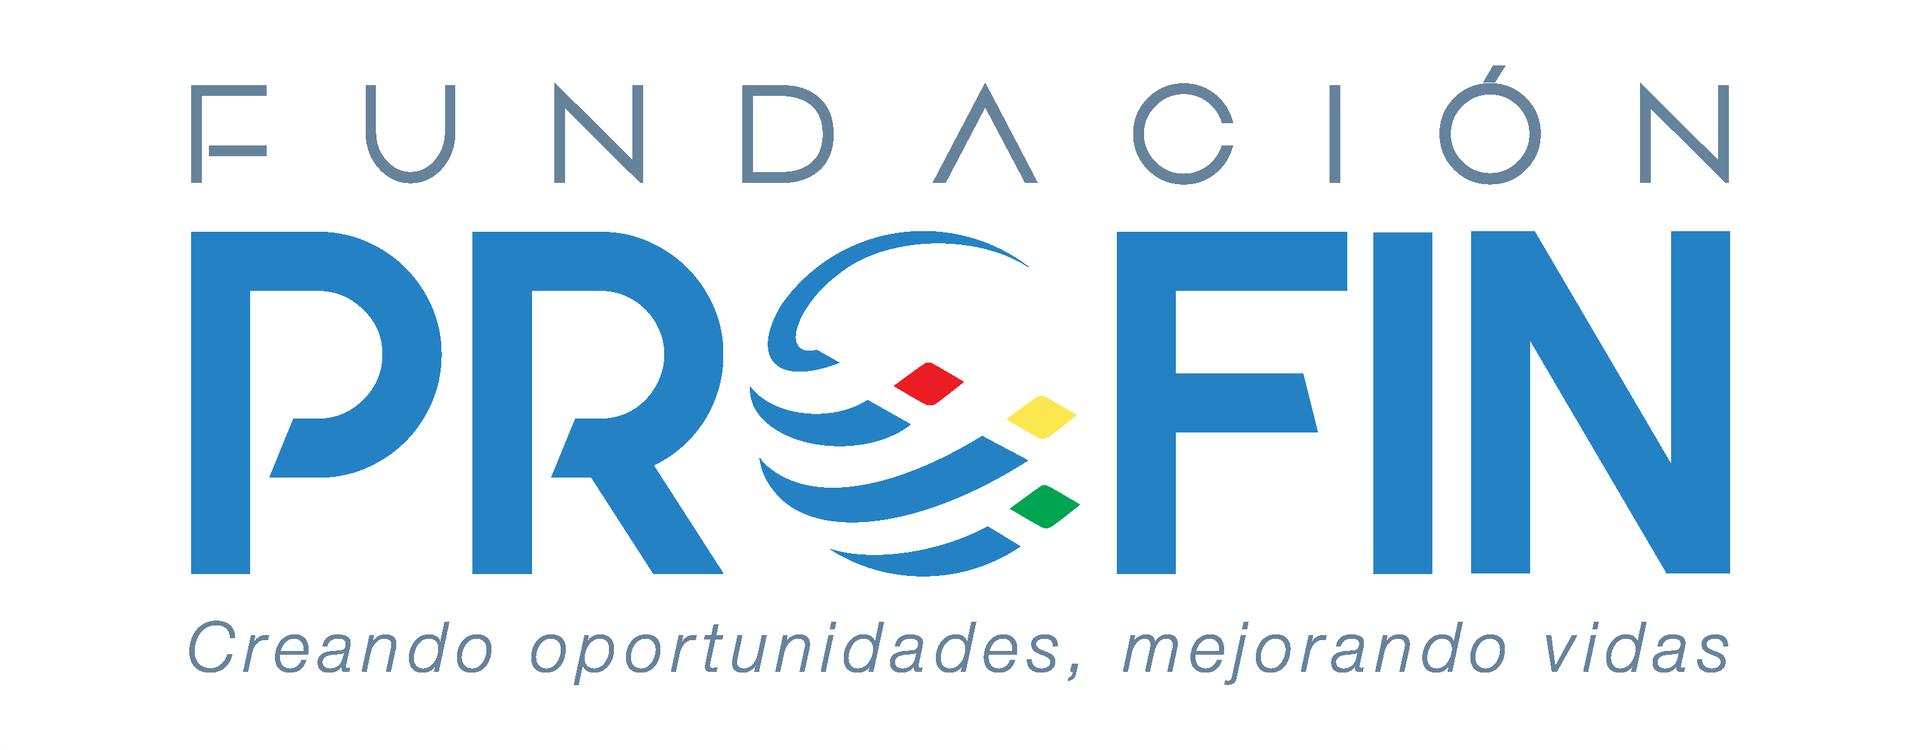 Fundacion PROFIN.png